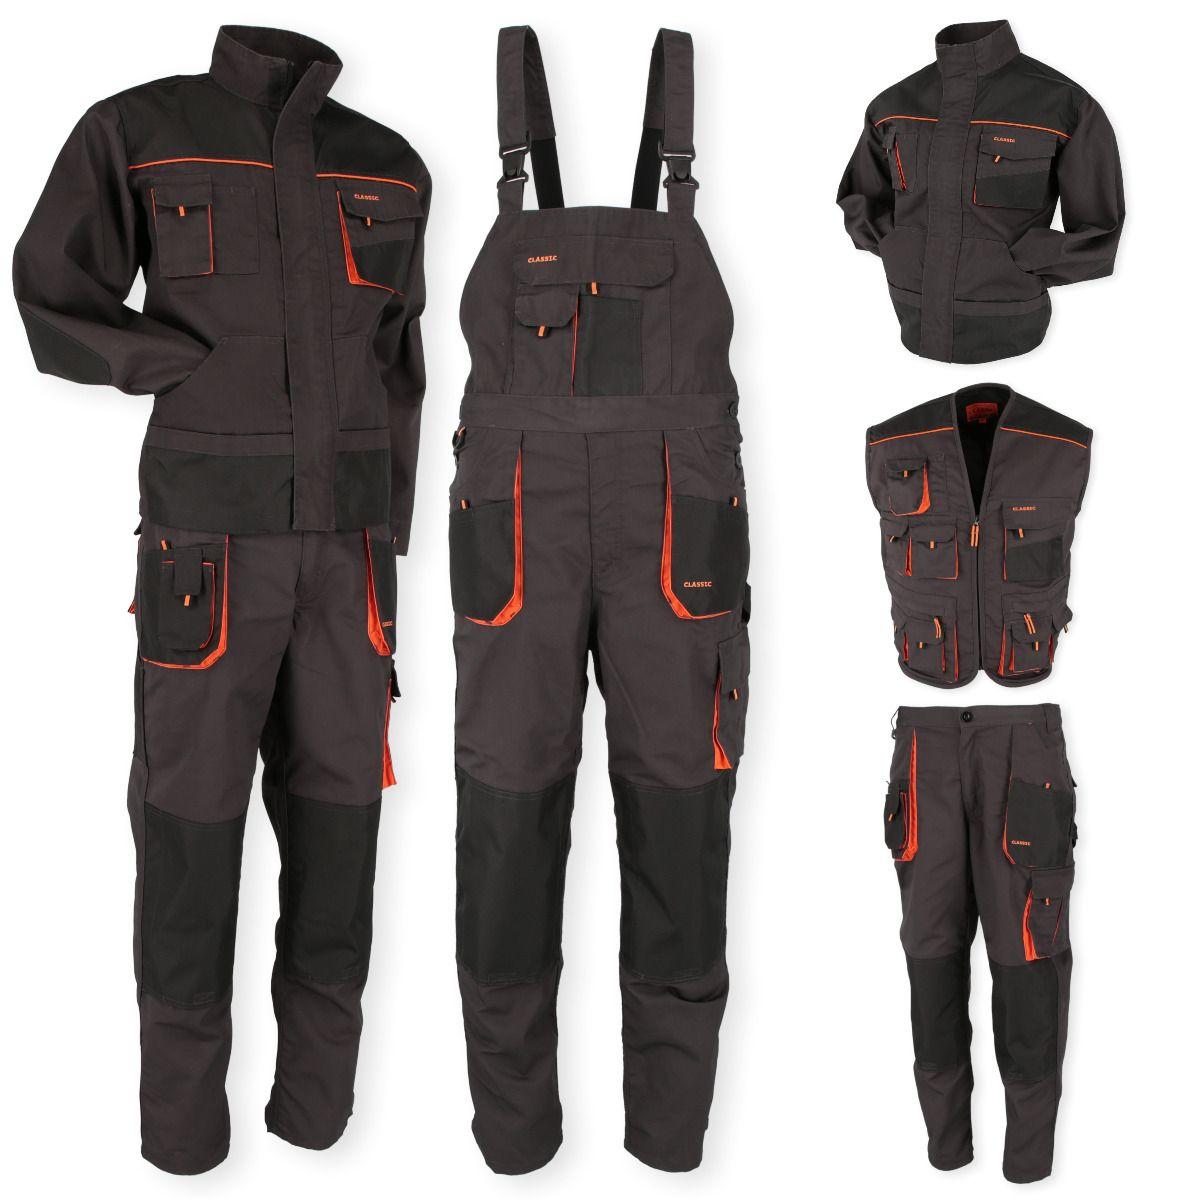 Ab 20 99 Arbeitshose Arbeitsjacke Latzhose Arbeitsweste Berufskleidung Grosse 46 62 Neu Mechanic Clothes Outdoor Outfit Mens Sweat Suits